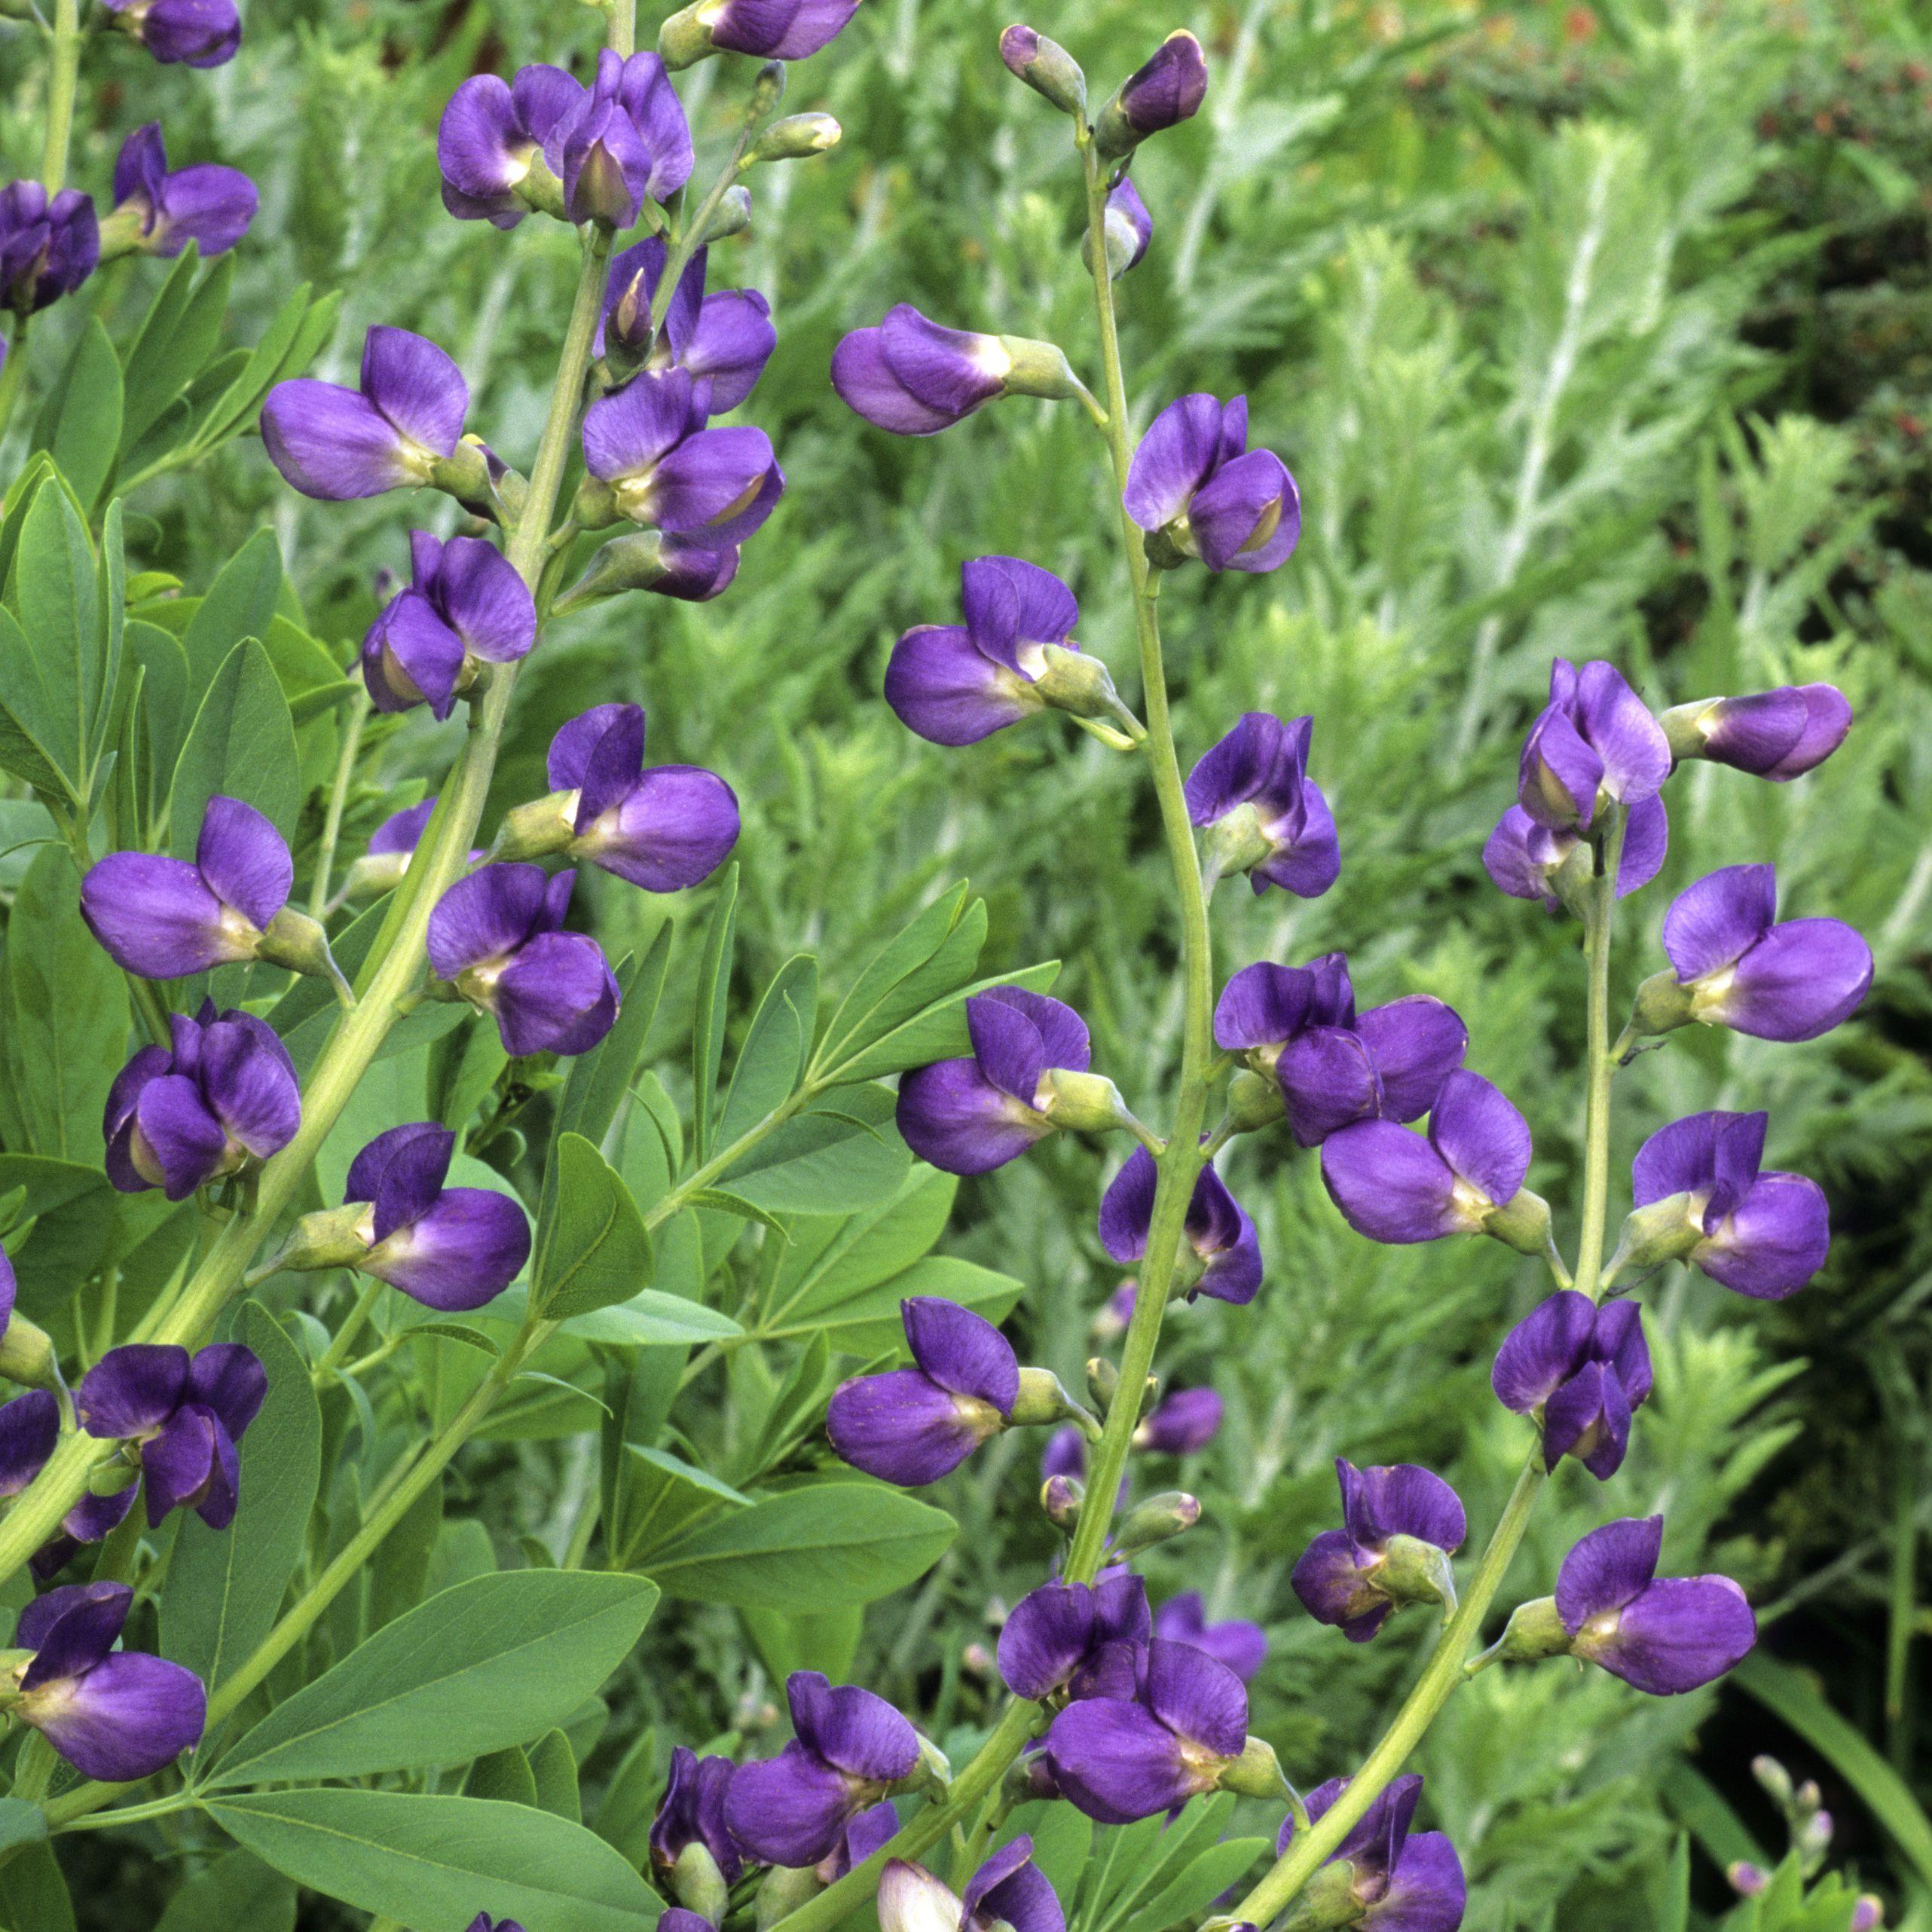 Baptisia australis, False Indigo, violet flowers